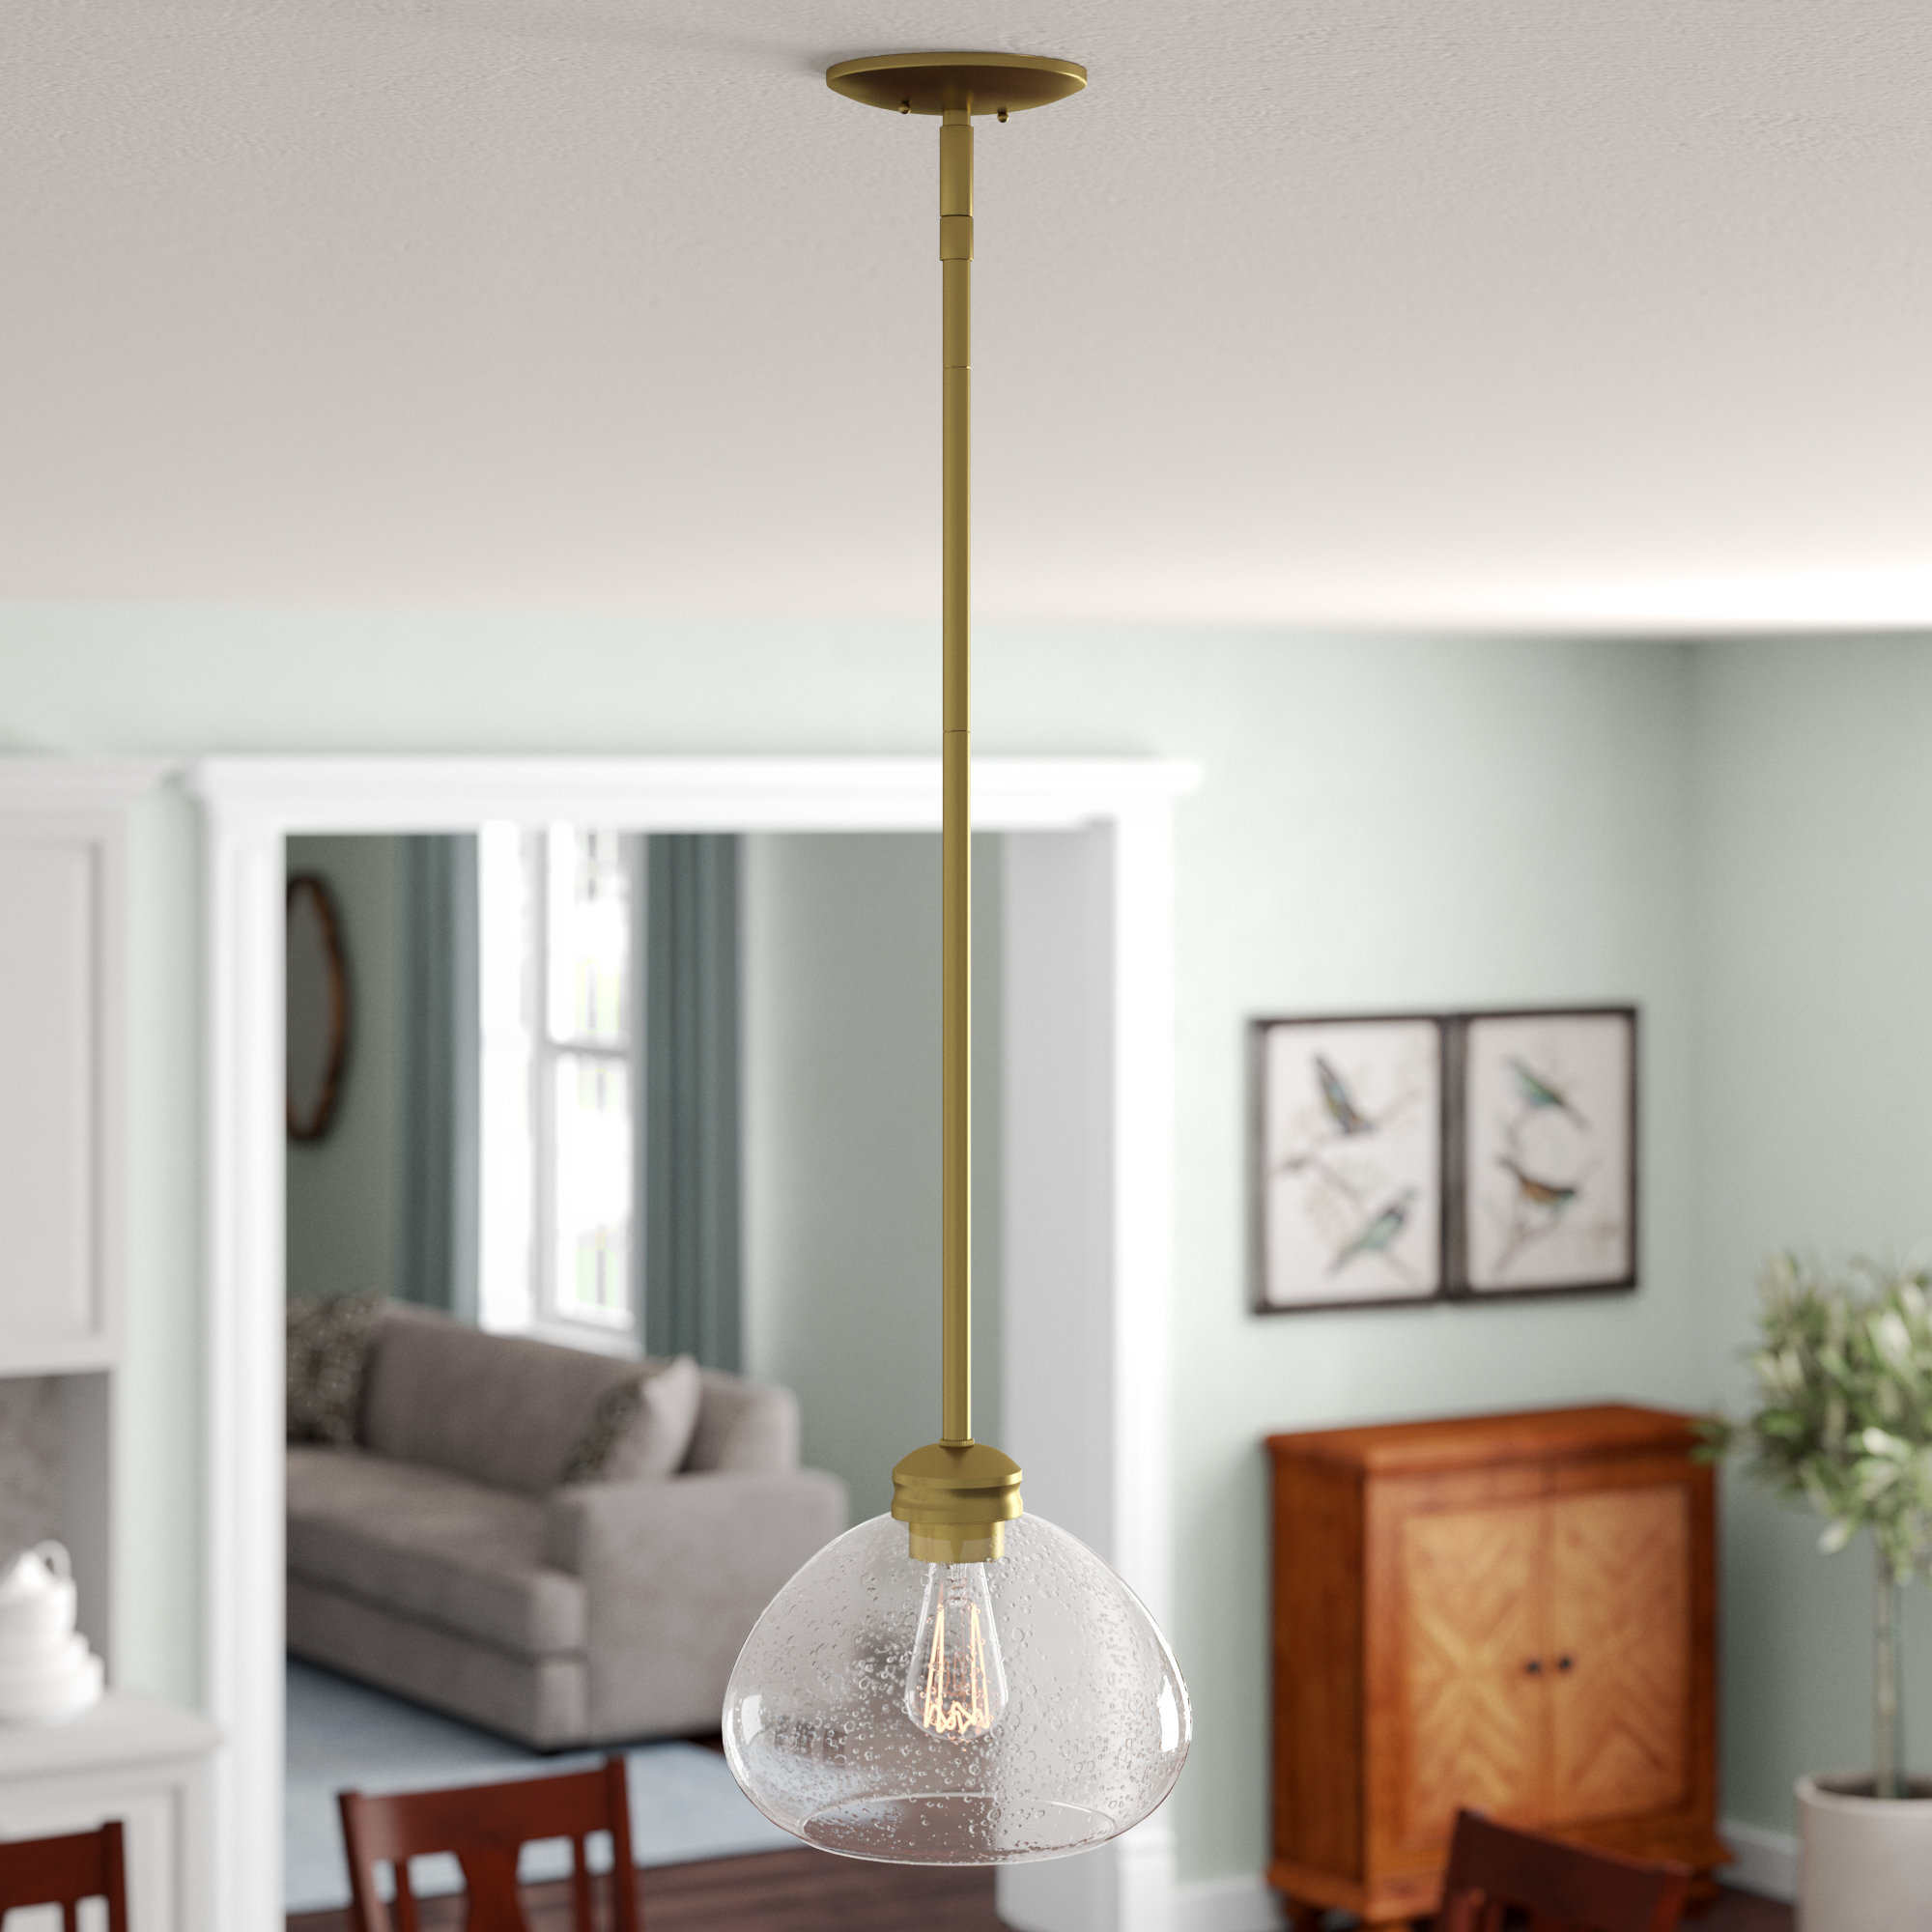 Most Recently Released Casselman 1 Light Globe Pendant In 1 Light Globe Pendants (View 14 of 20)